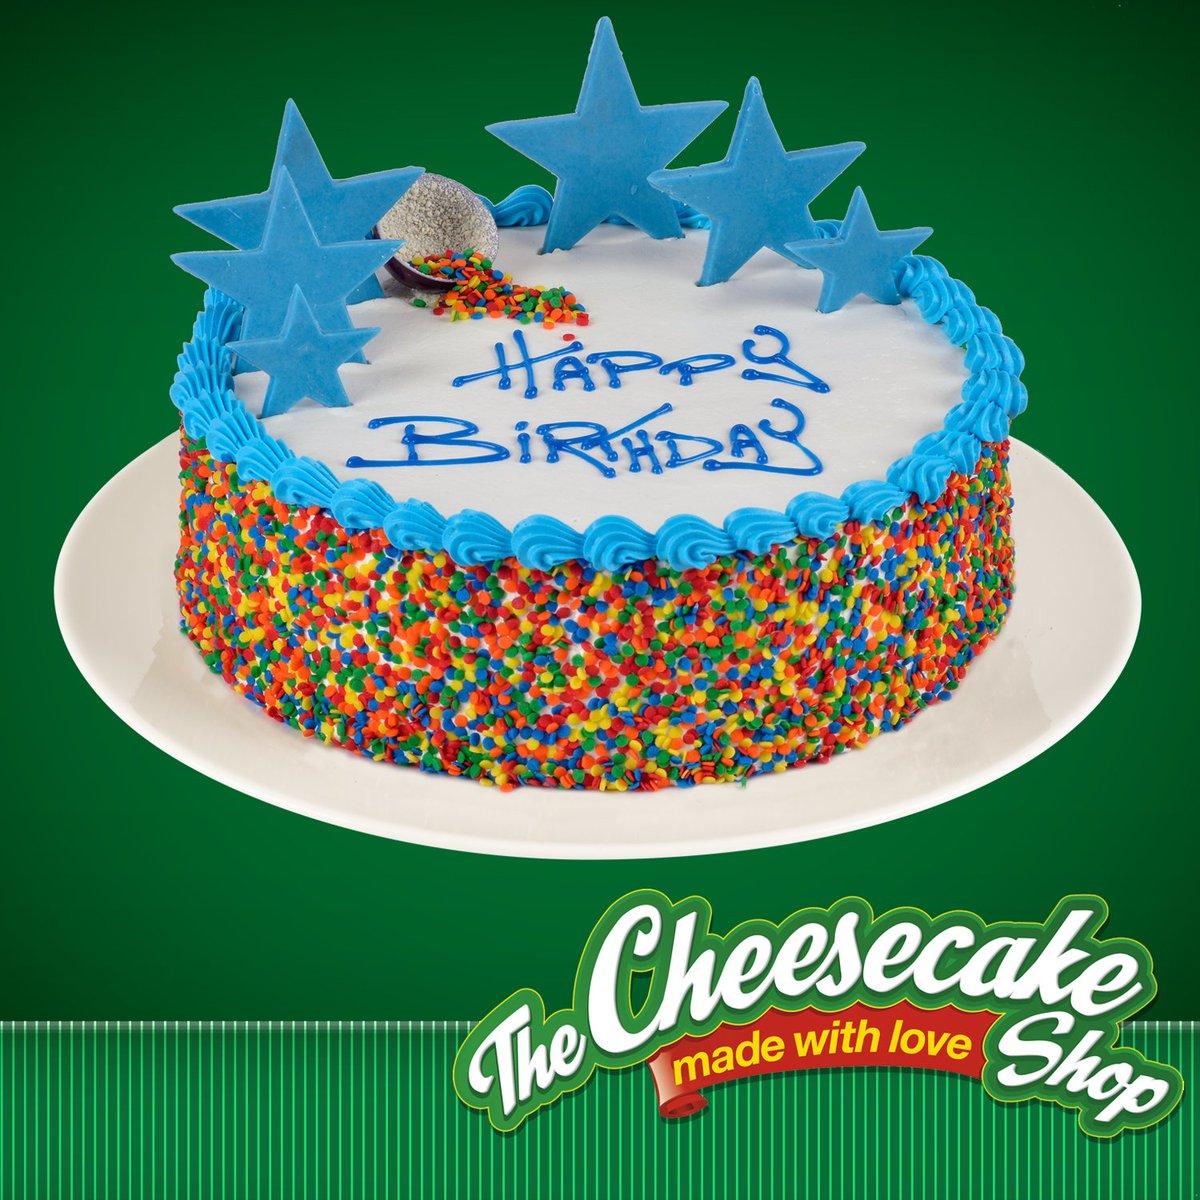 The Cheesecake Shop Cheesecakeshop Twitter